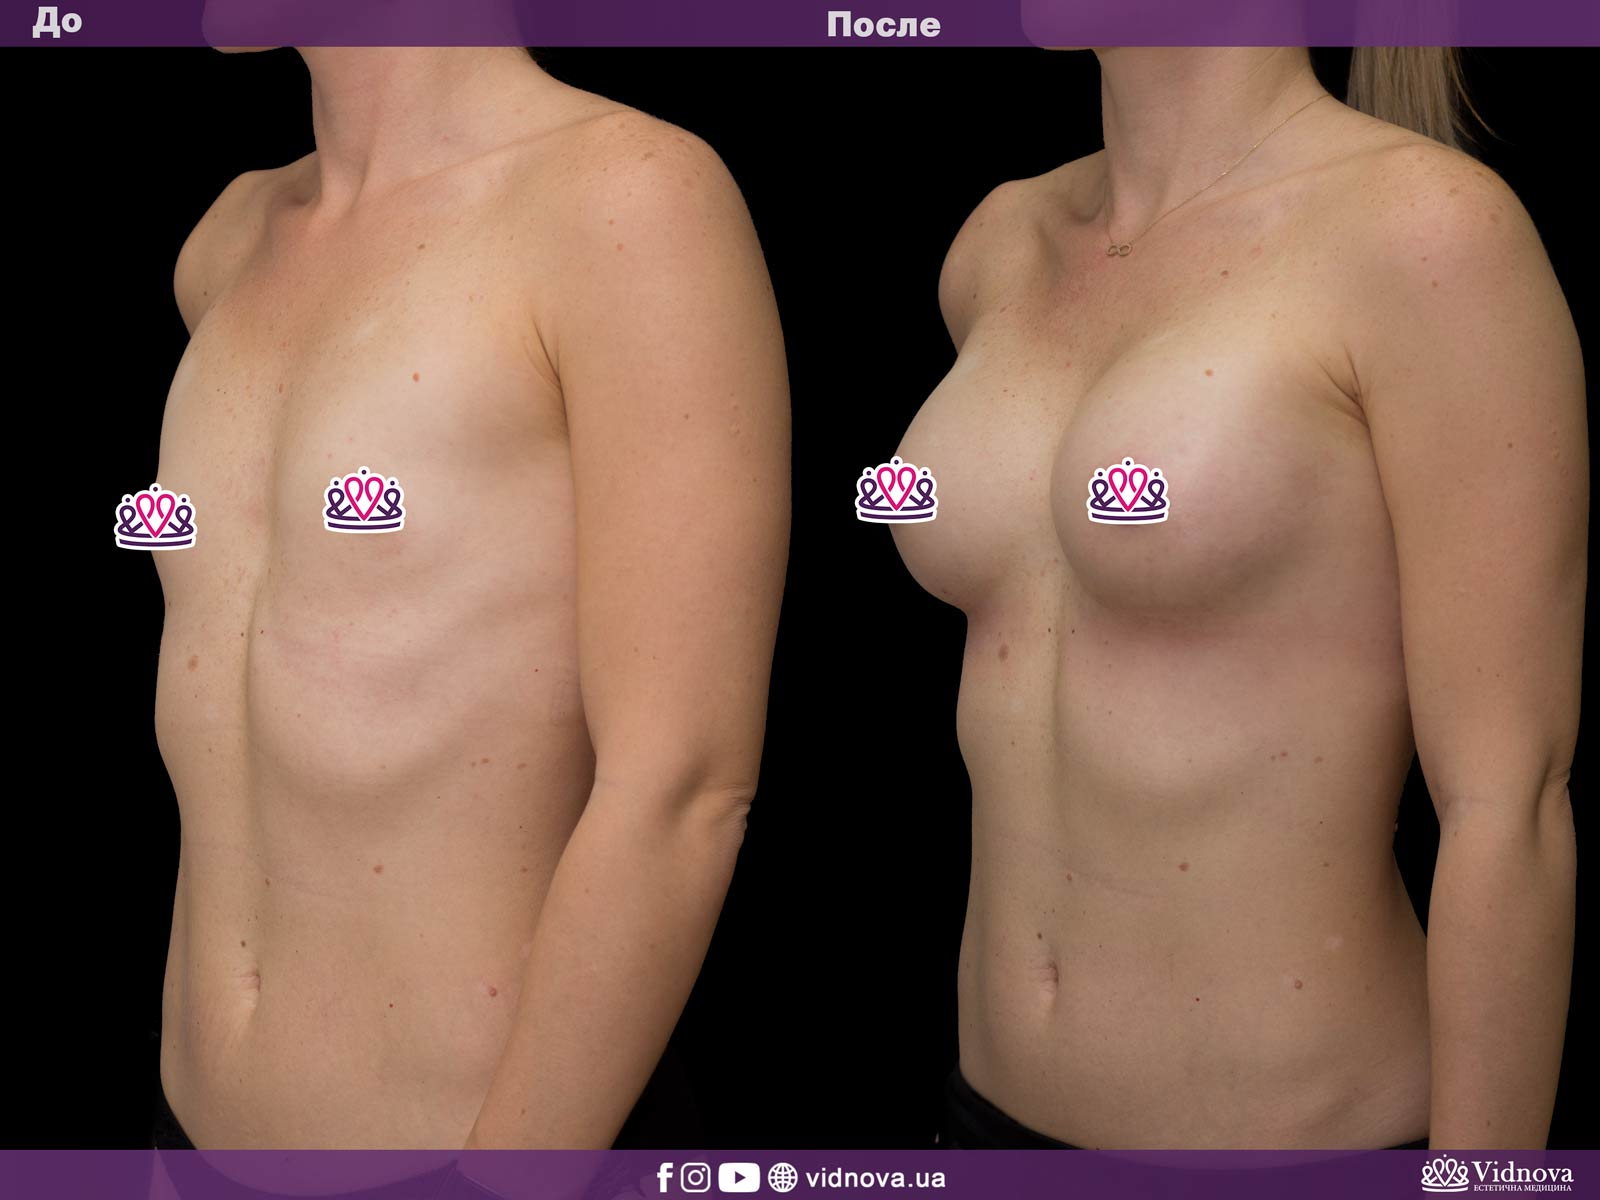 Увеличение груди: Фото ДО и ПОСЛЕ - Пример №29-2 - Клиника Vidnova